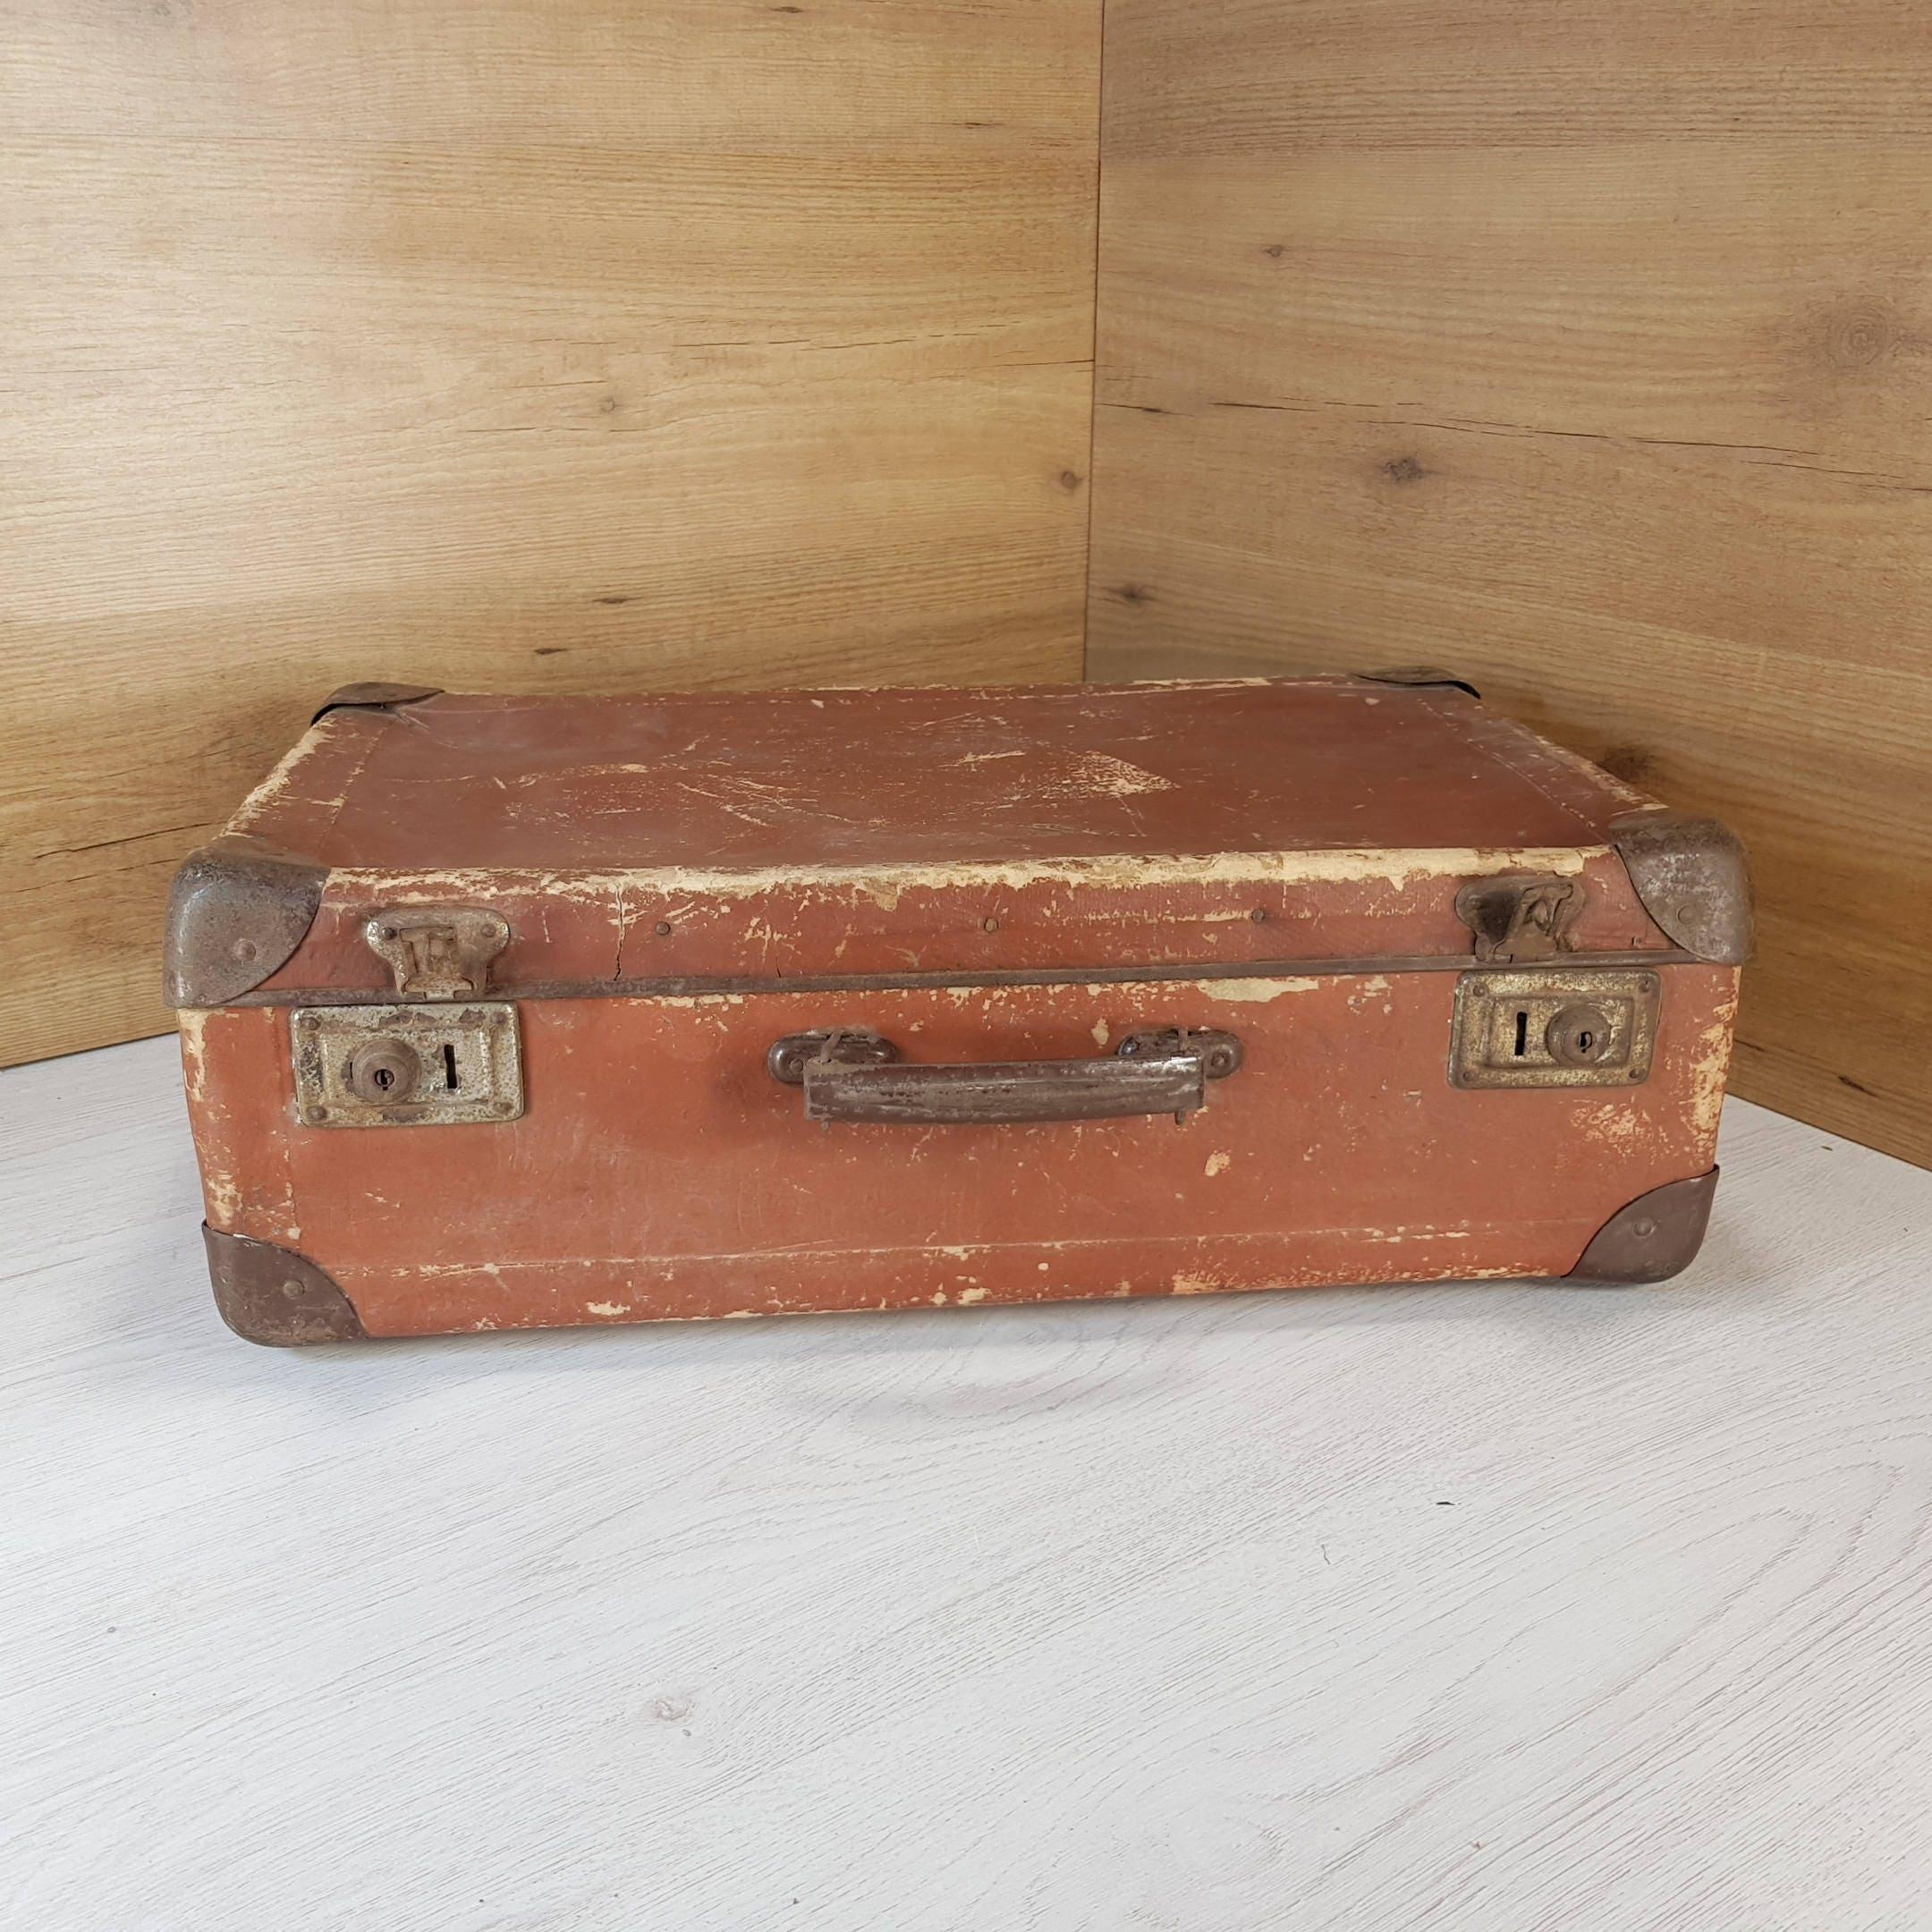 valise vintage vieille valise valise en carton valise etsy. Black Bedroom Furniture Sets. Home Design Ideas